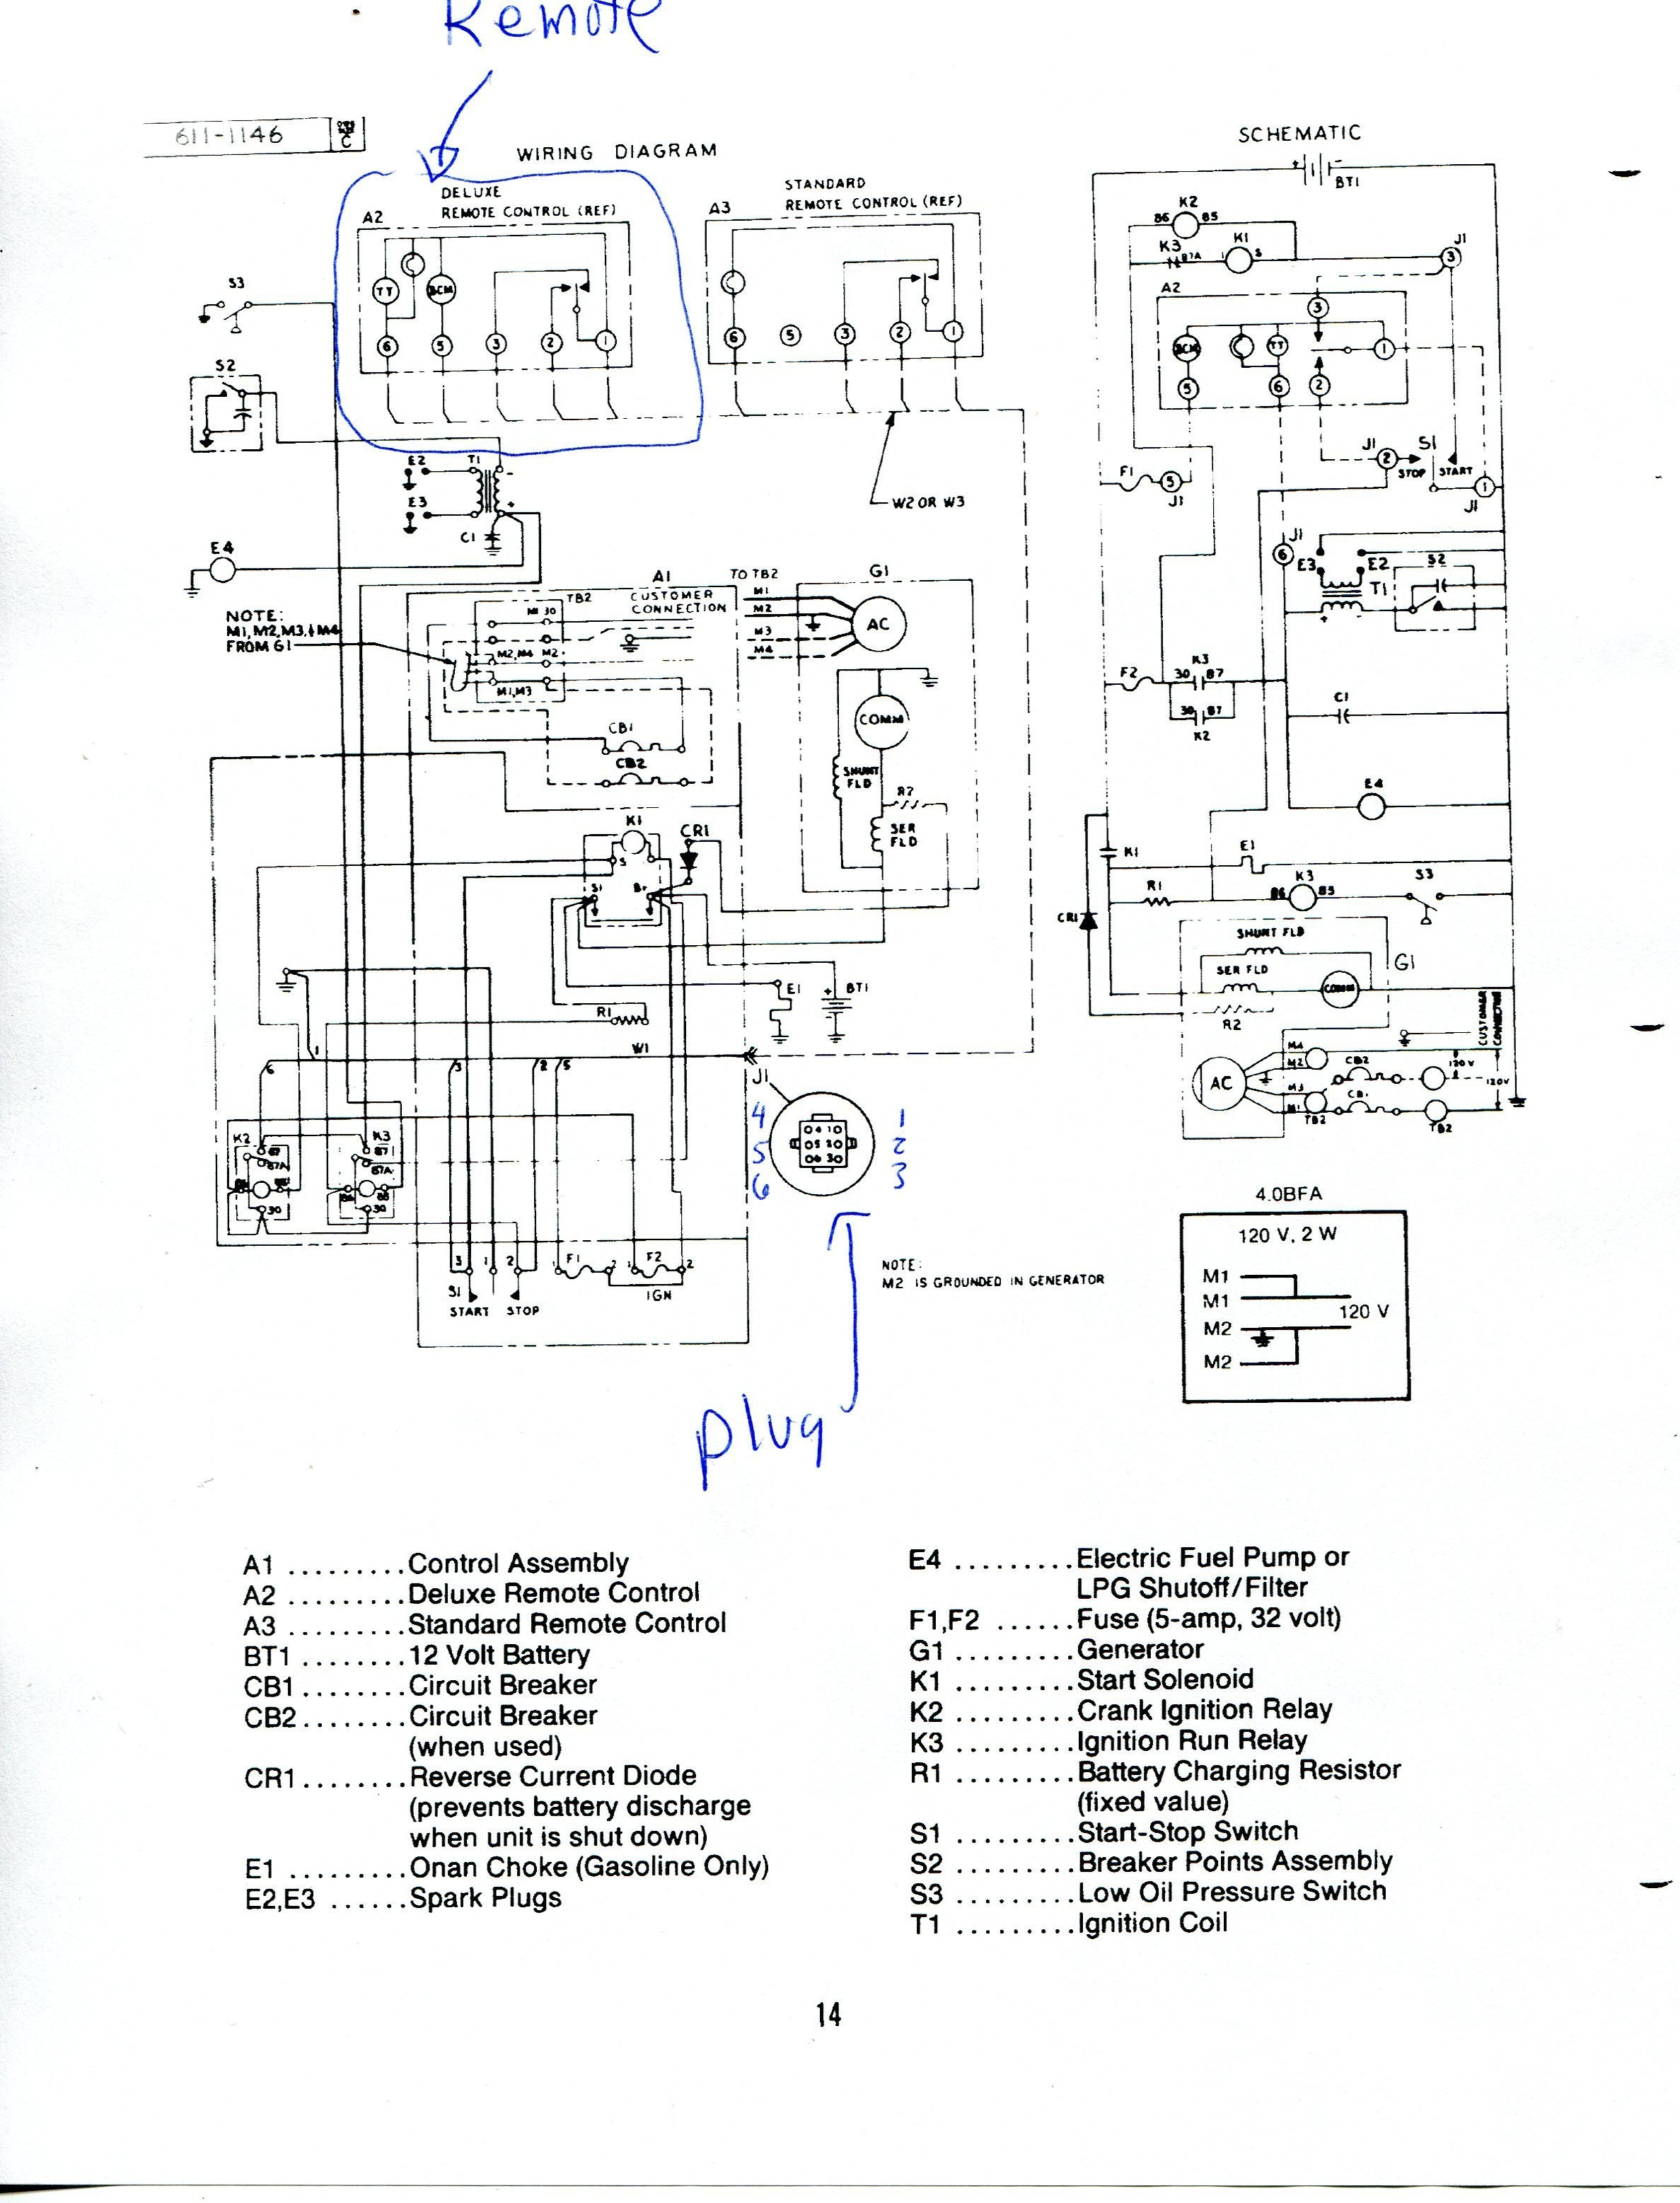 Remote Starter Wiring Diagram Wiring Diagram An Generator New Wiring Diagram for 6 5 An Of Remote Starter Wiring Diagram